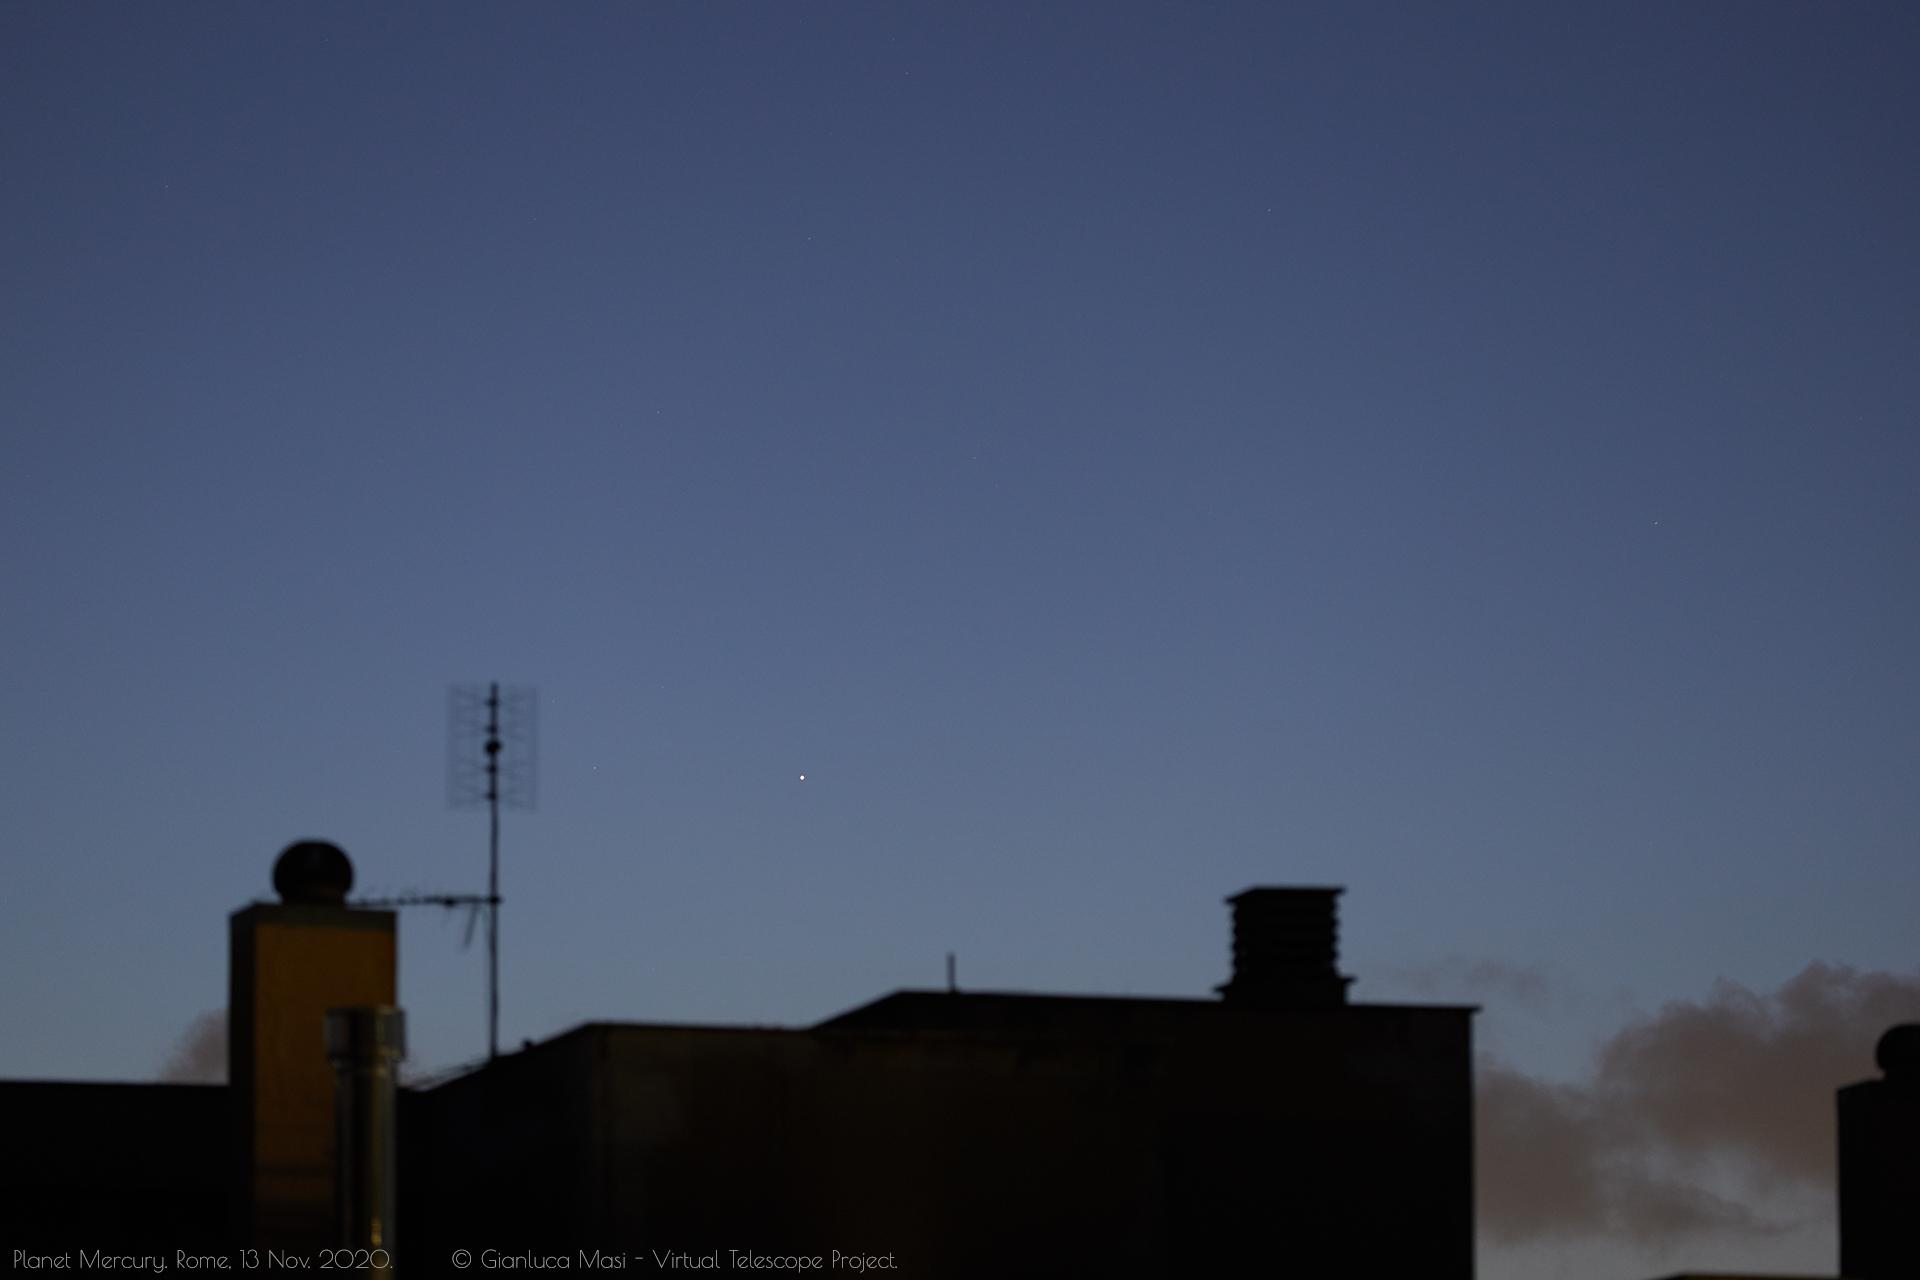 PlanePlanet Mercury at dawn. 13 Nov. 2020.t Mercury at dawn. 13 Nov. 2020.